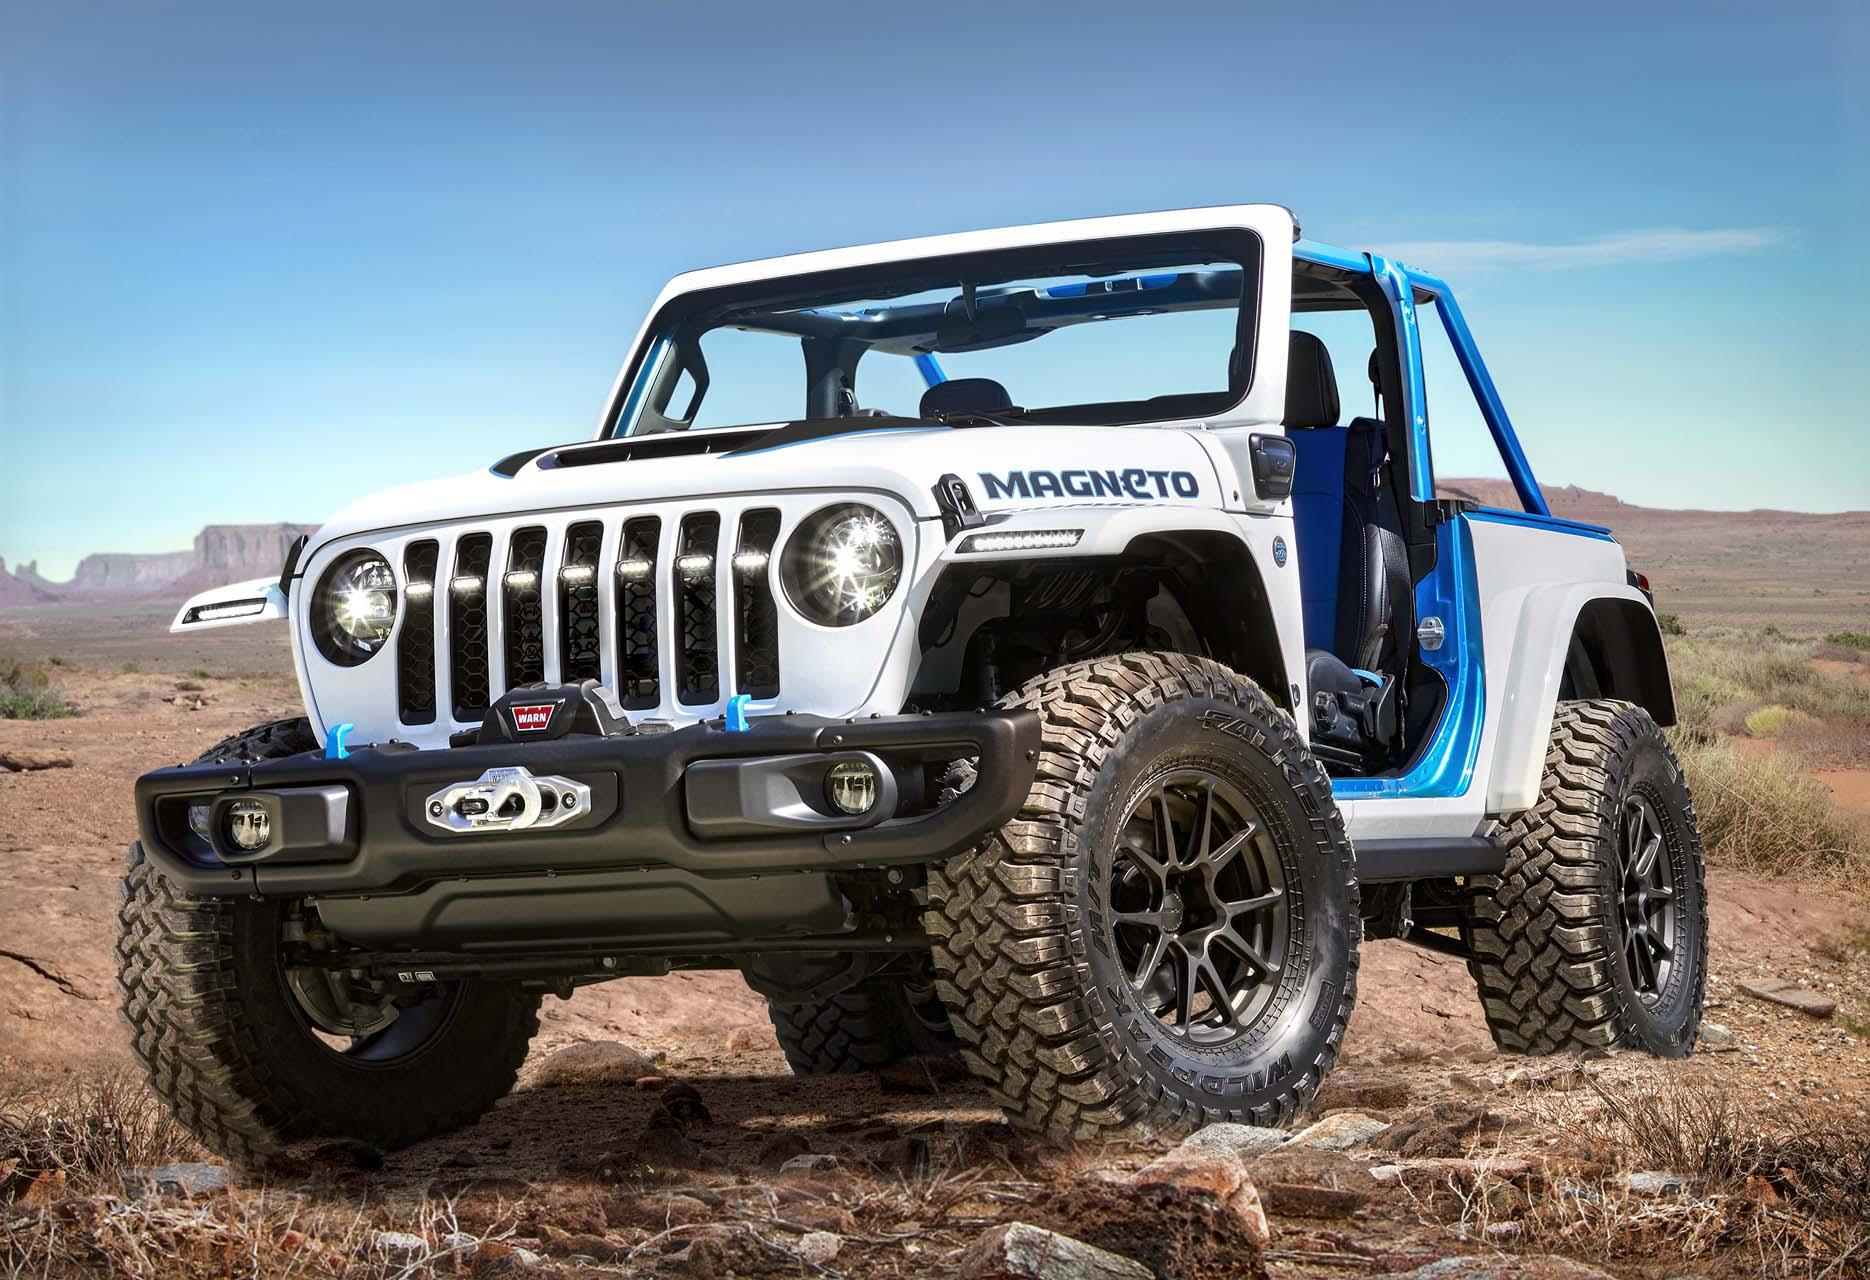 Electric Jeep Wrangler Magneto headlines 2021 Moab Easter Safari concepts